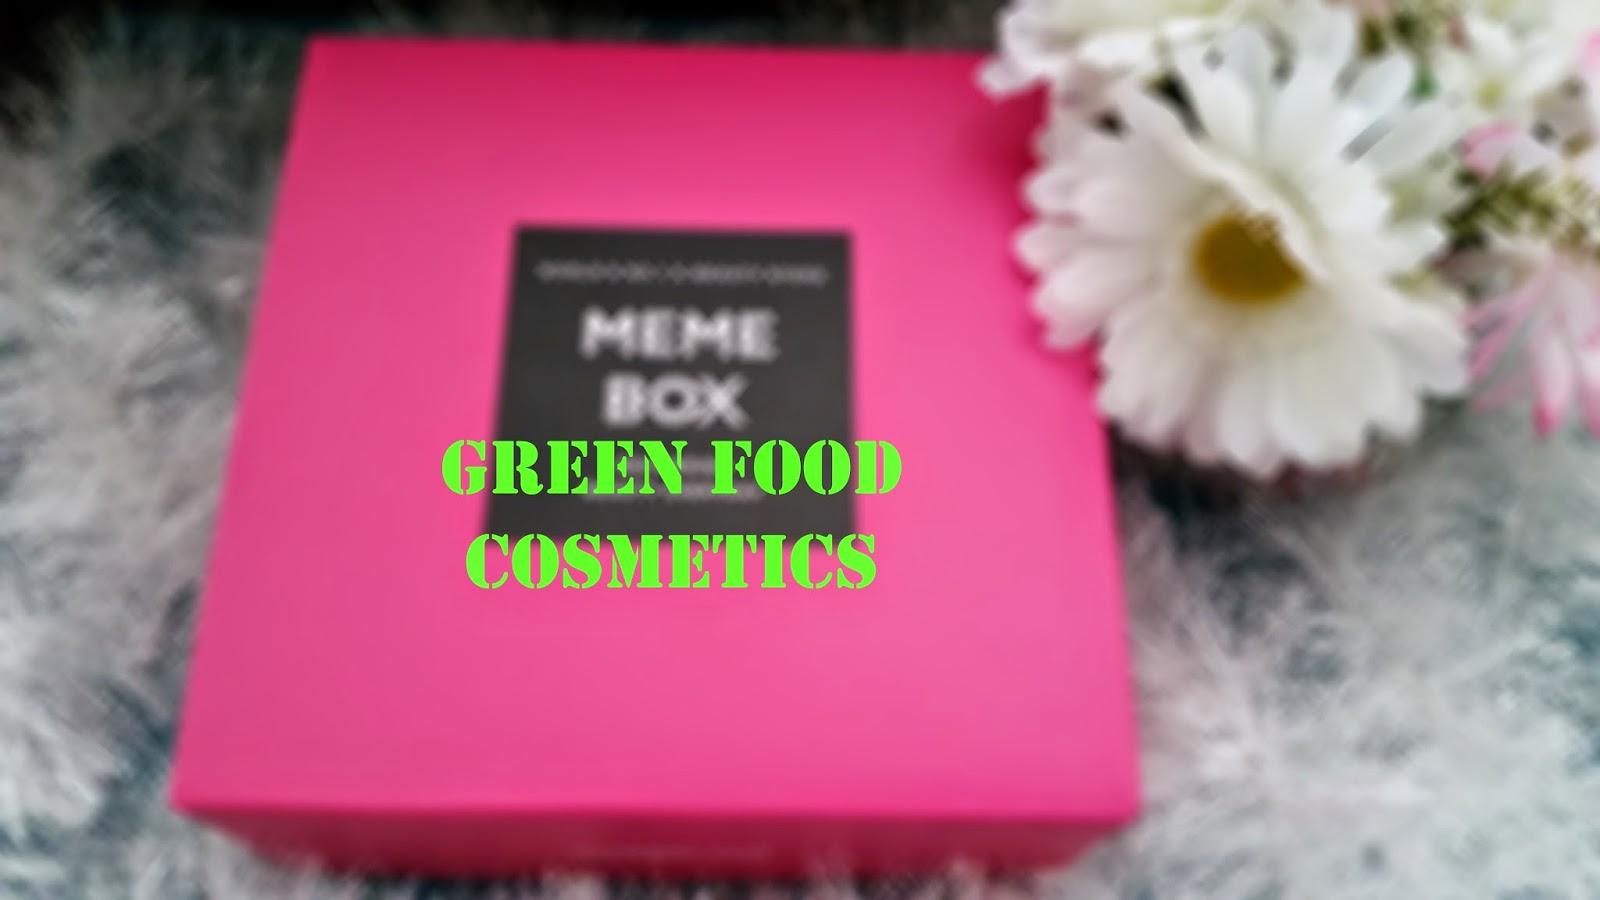 Memebox Green Food Cosmetics